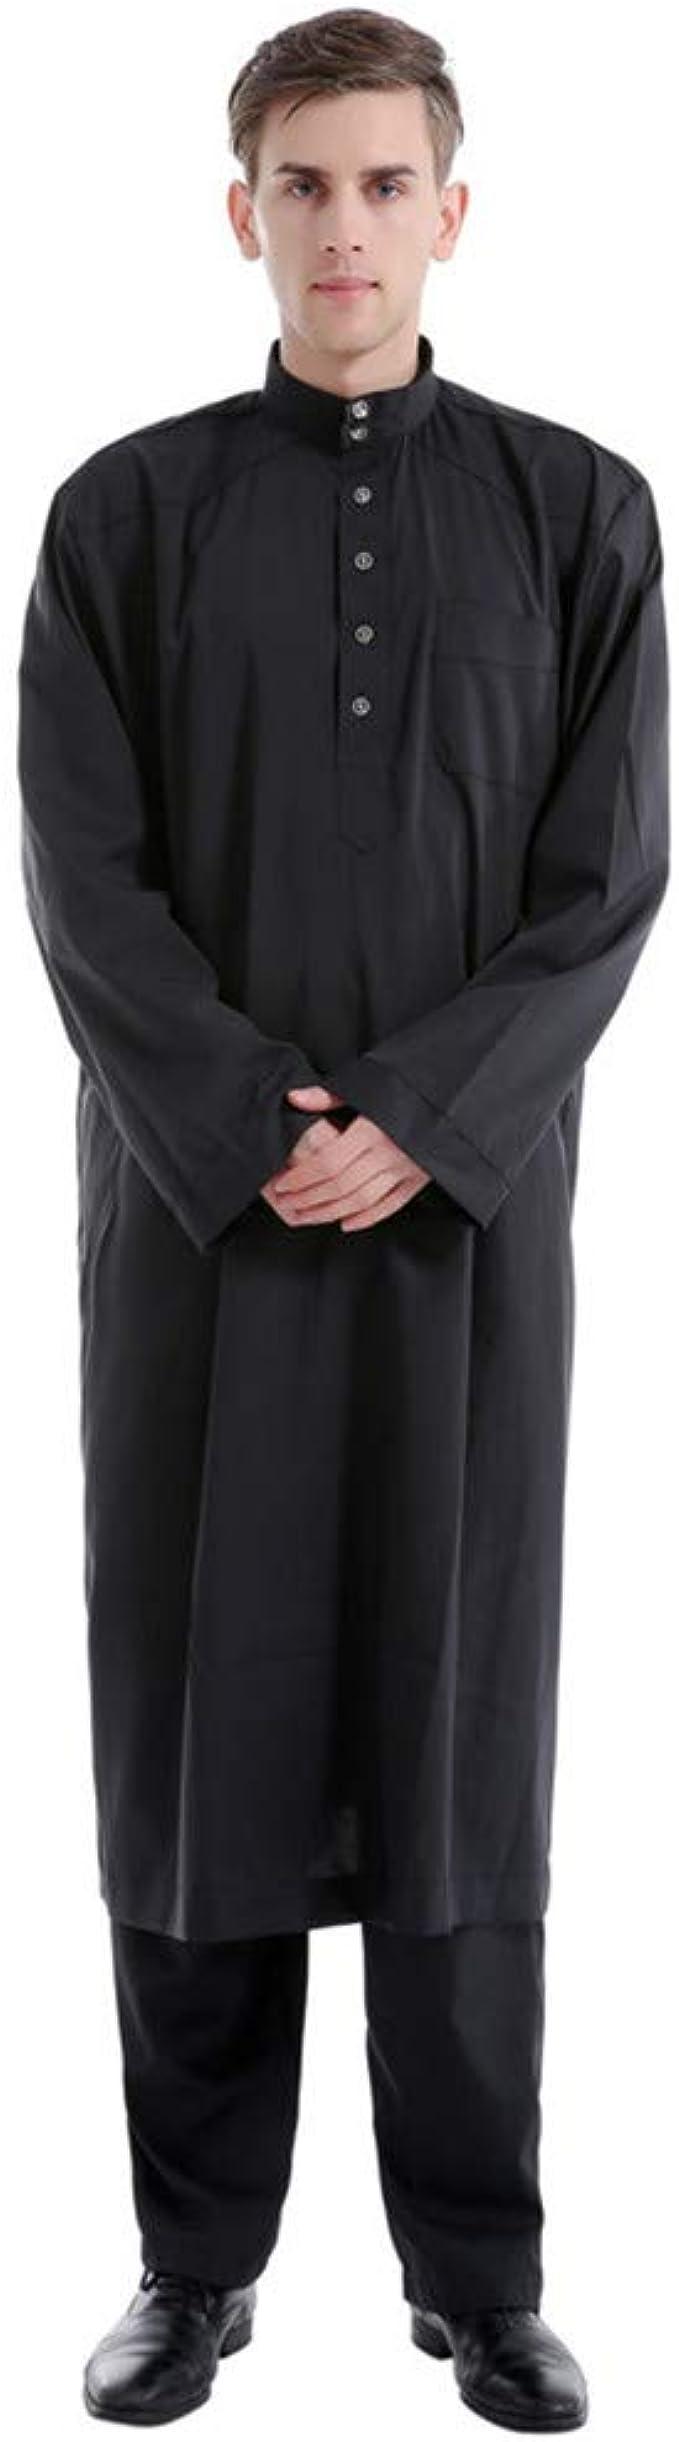 Mens Thobe with Long Sleeves Arab Muslim Islamic Ethnic Long Robes Calf Length with Pants Casual Business Kaftan Sets